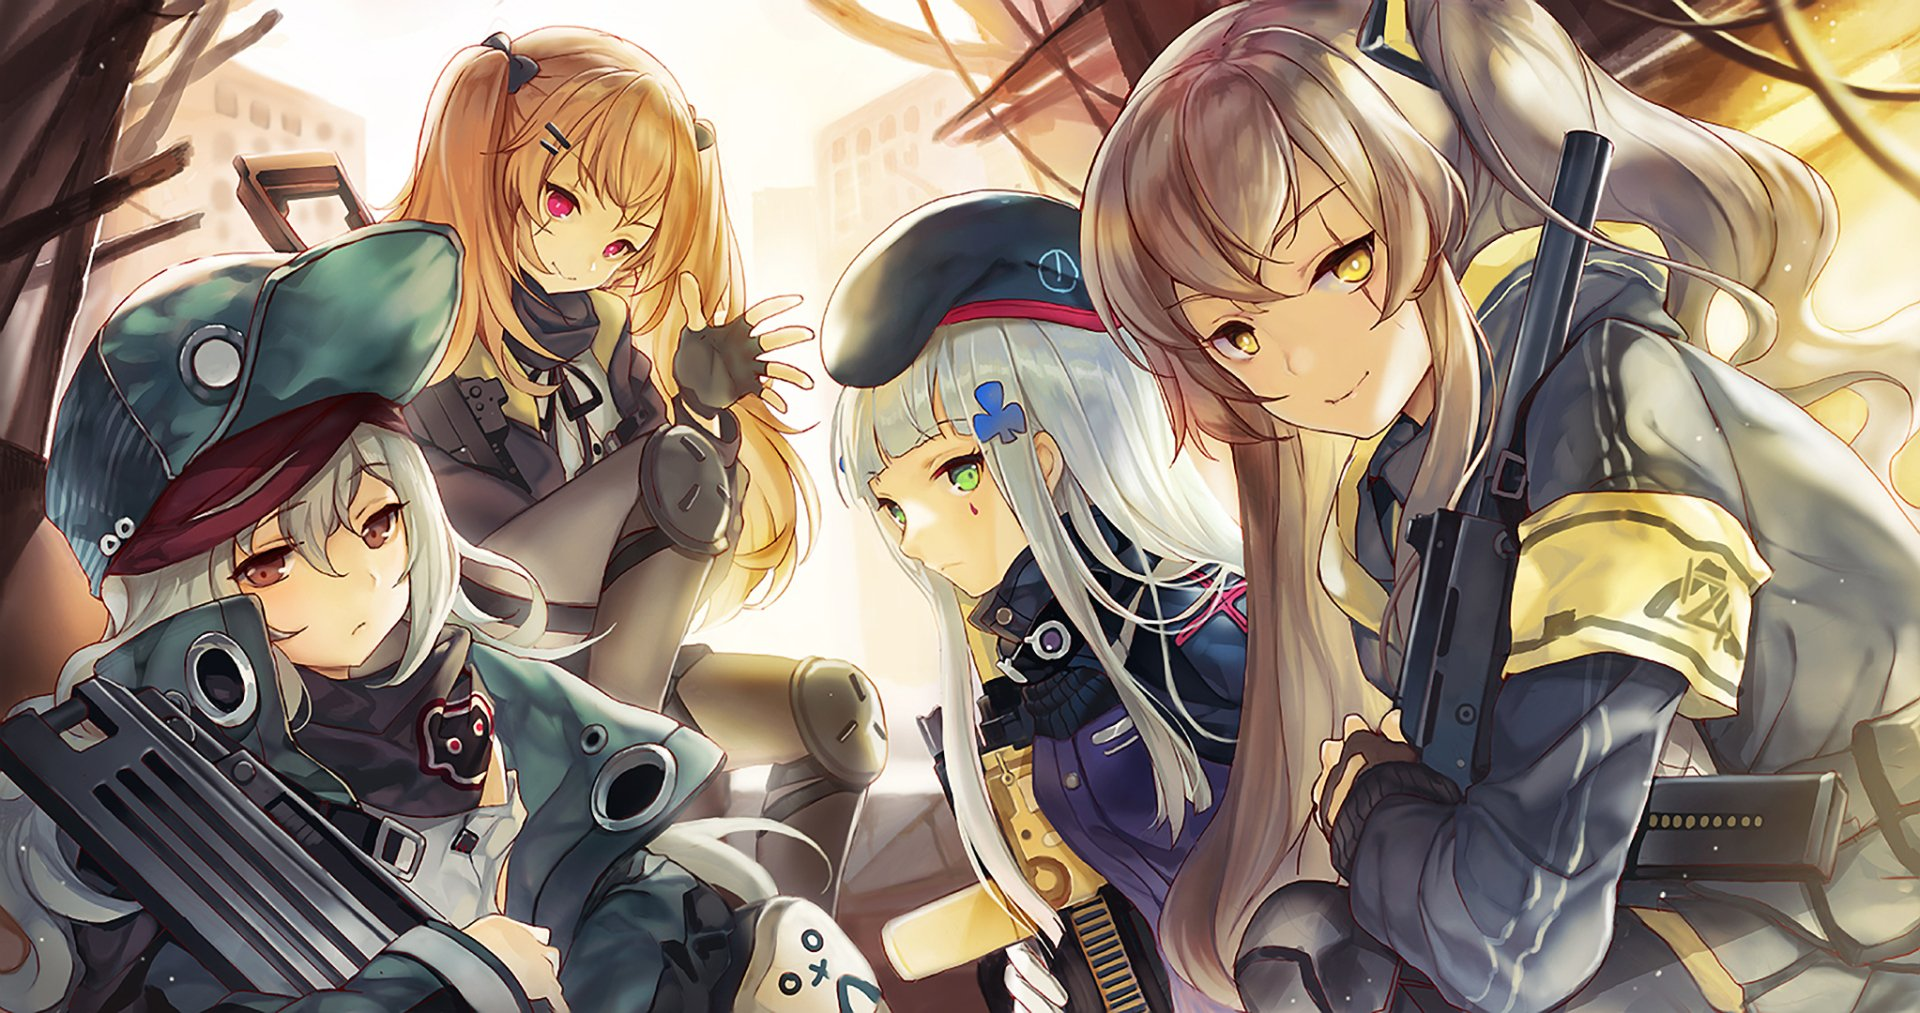 Anime Sniper Girl Wallpaper Hd 少女前线 高清壁纸 桌面背景 2046x1080 Id 943160 Wallpaper Abyss